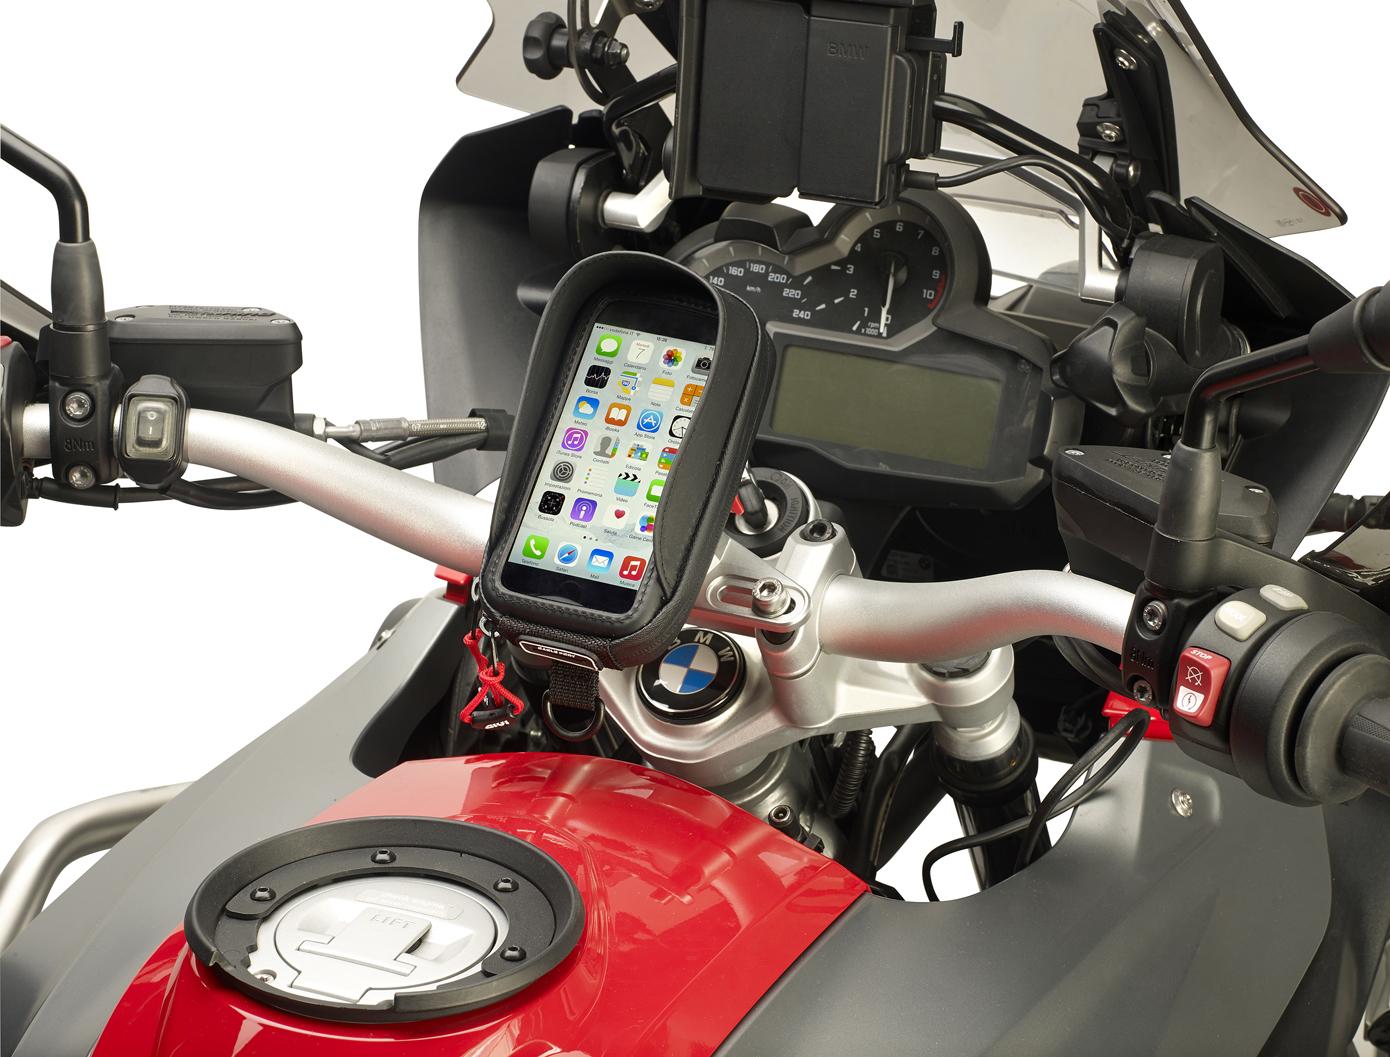 Givi s956b porta smartphone porta navigatore givi s956b - Porta navigatore givi ...